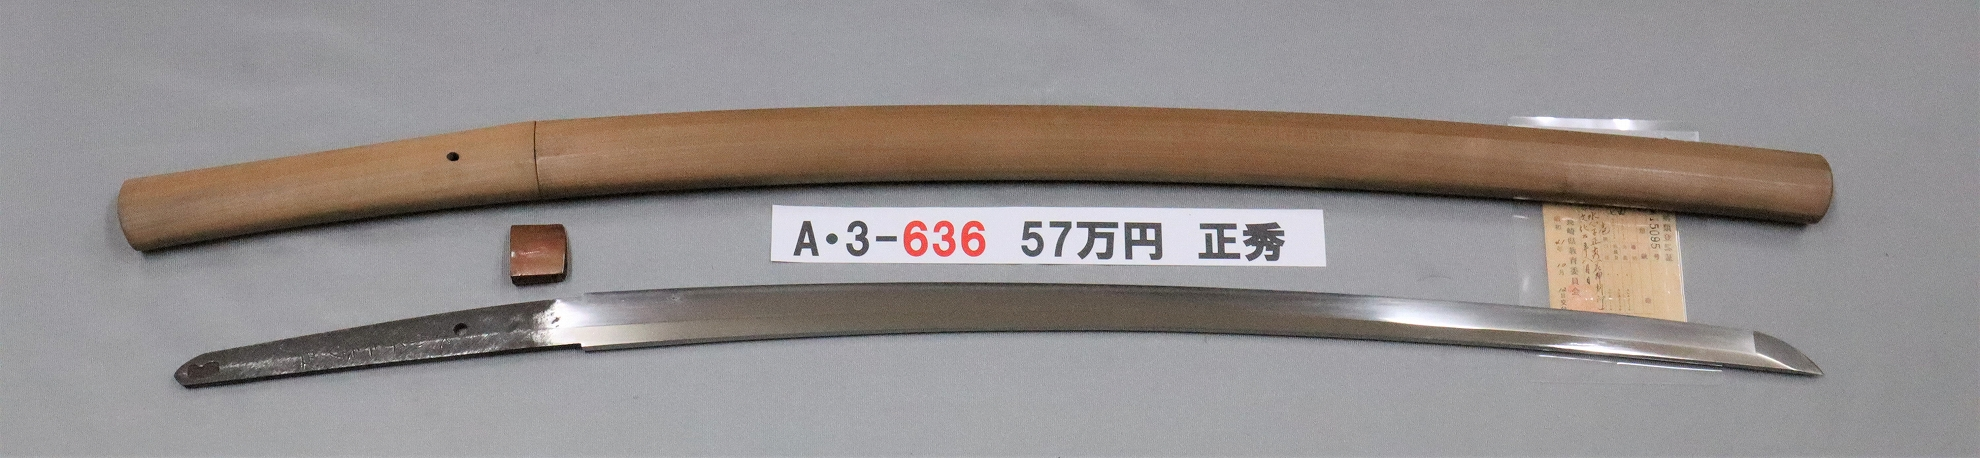 A3636